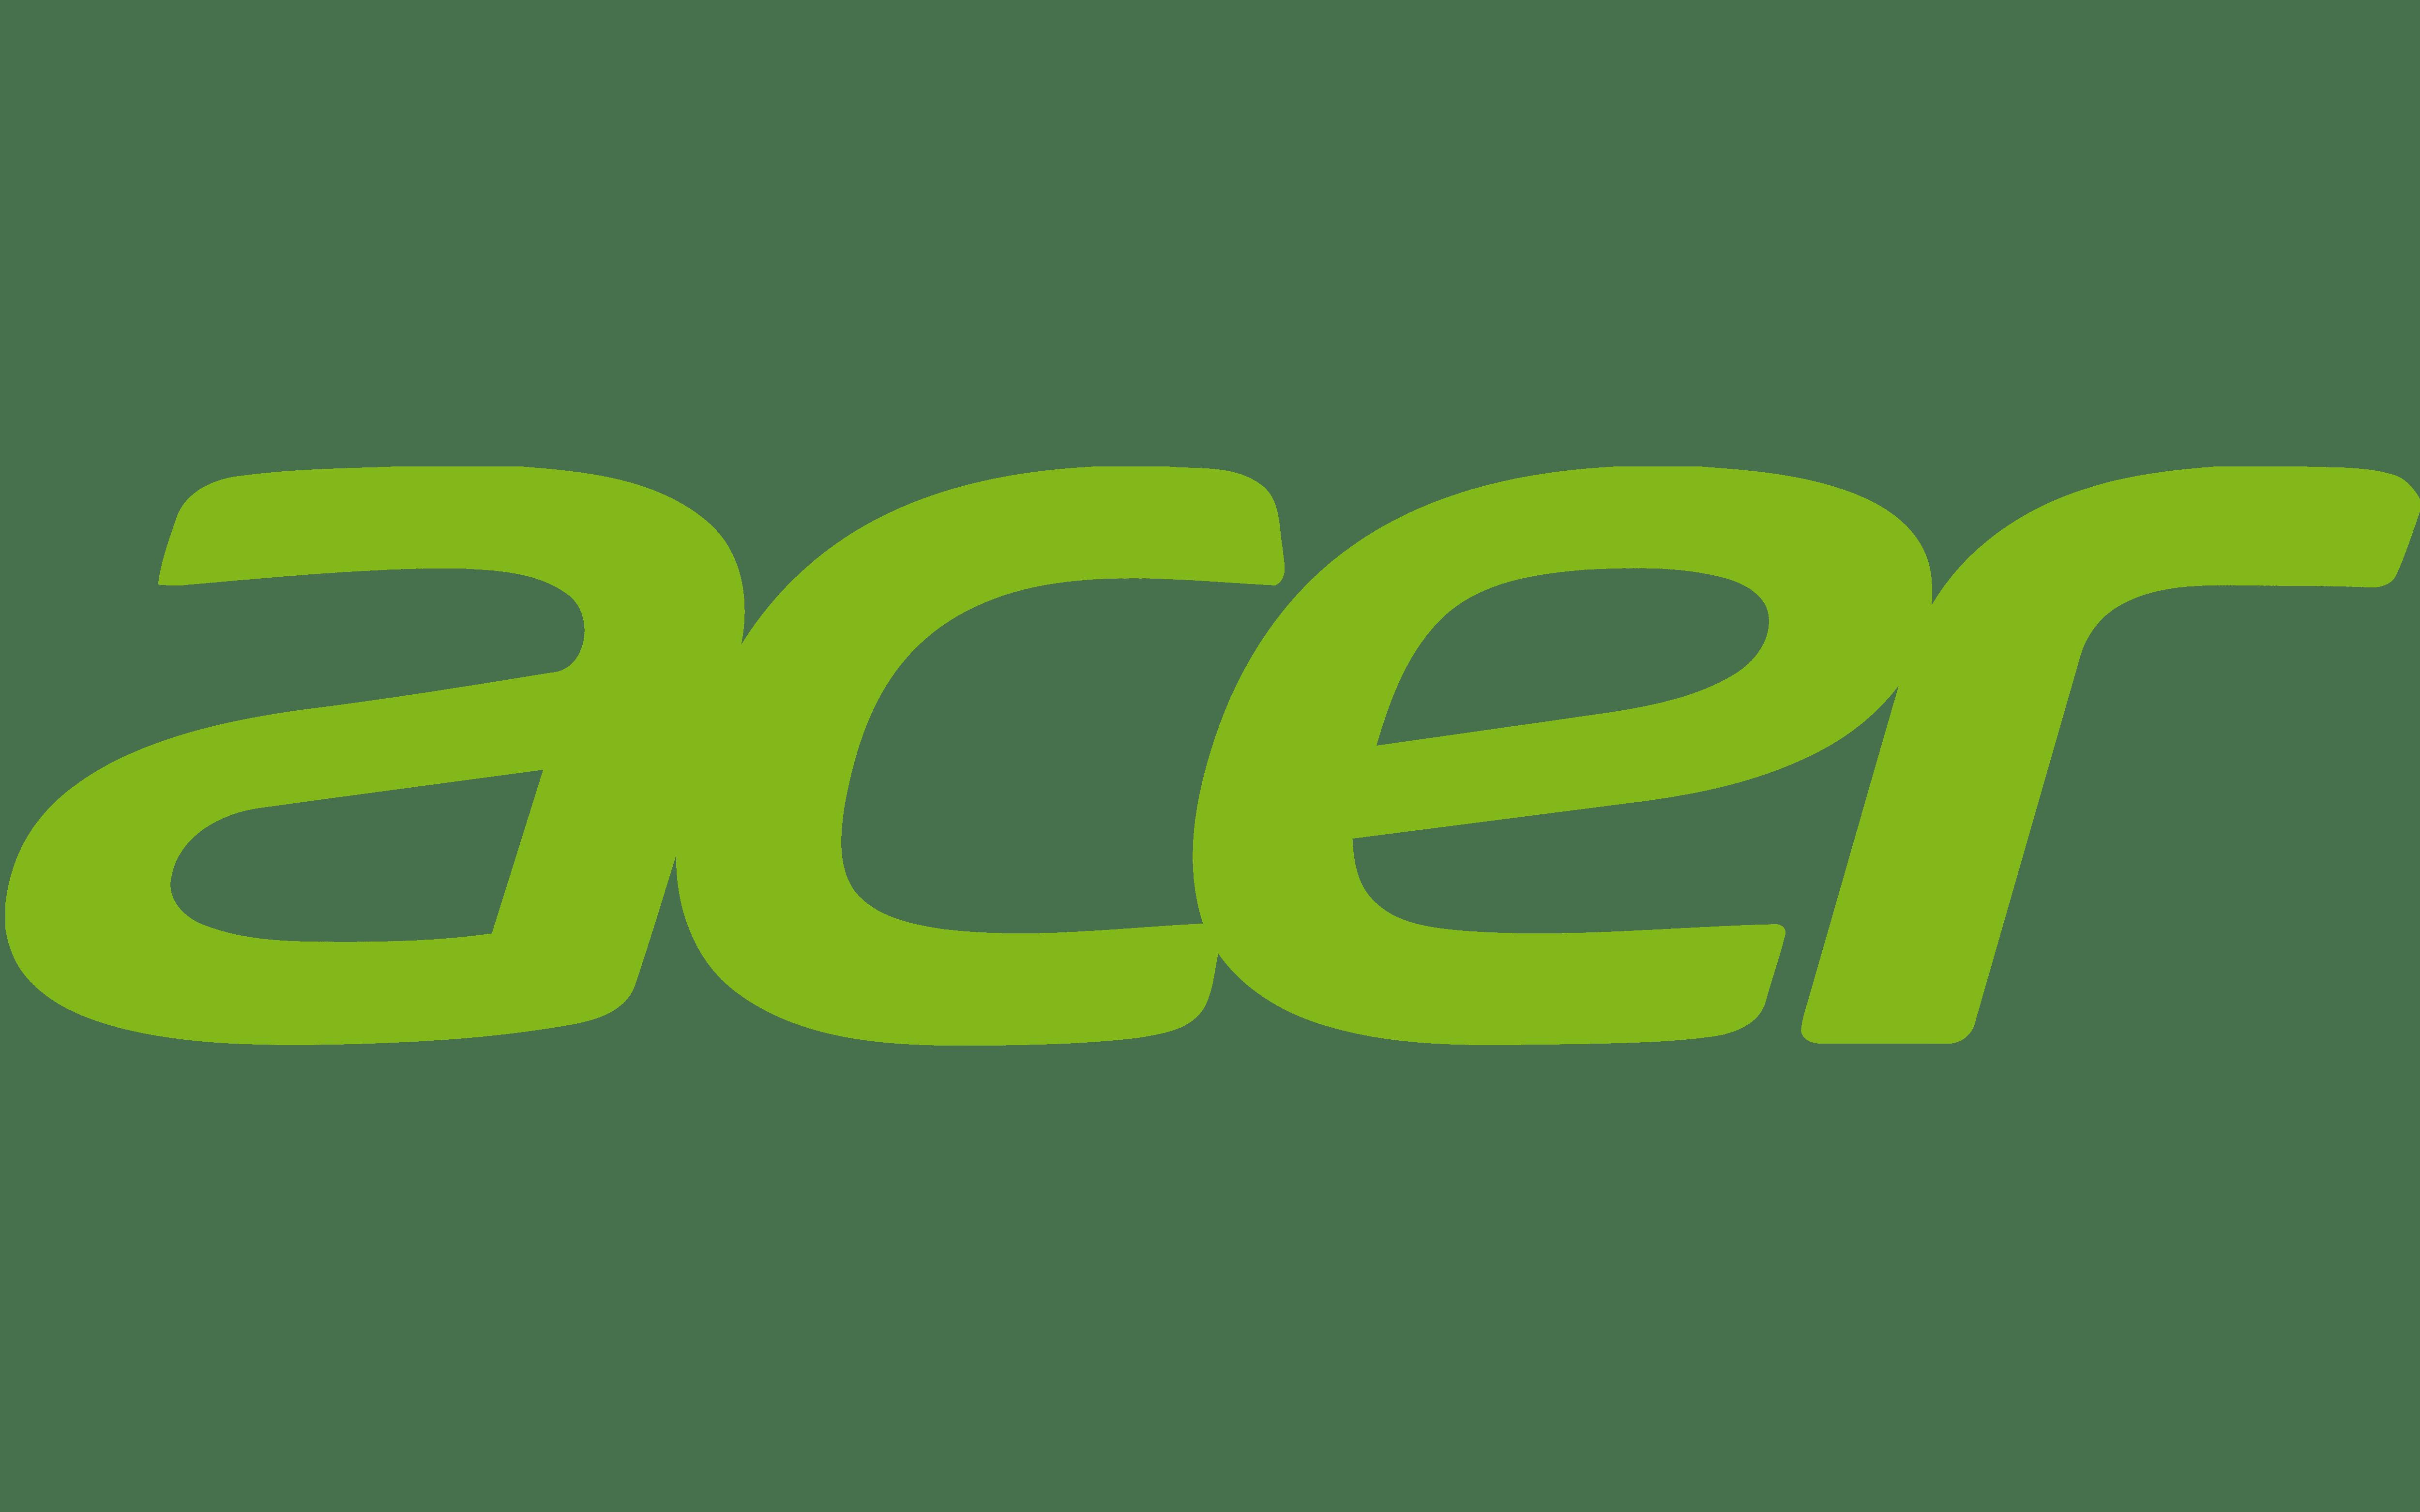 Baterie T6 power Acer Aspire ES1-711, E5-721, V3-371, 3150mAh, 48Wh, 4cell, Li-ion; NBAC0080B